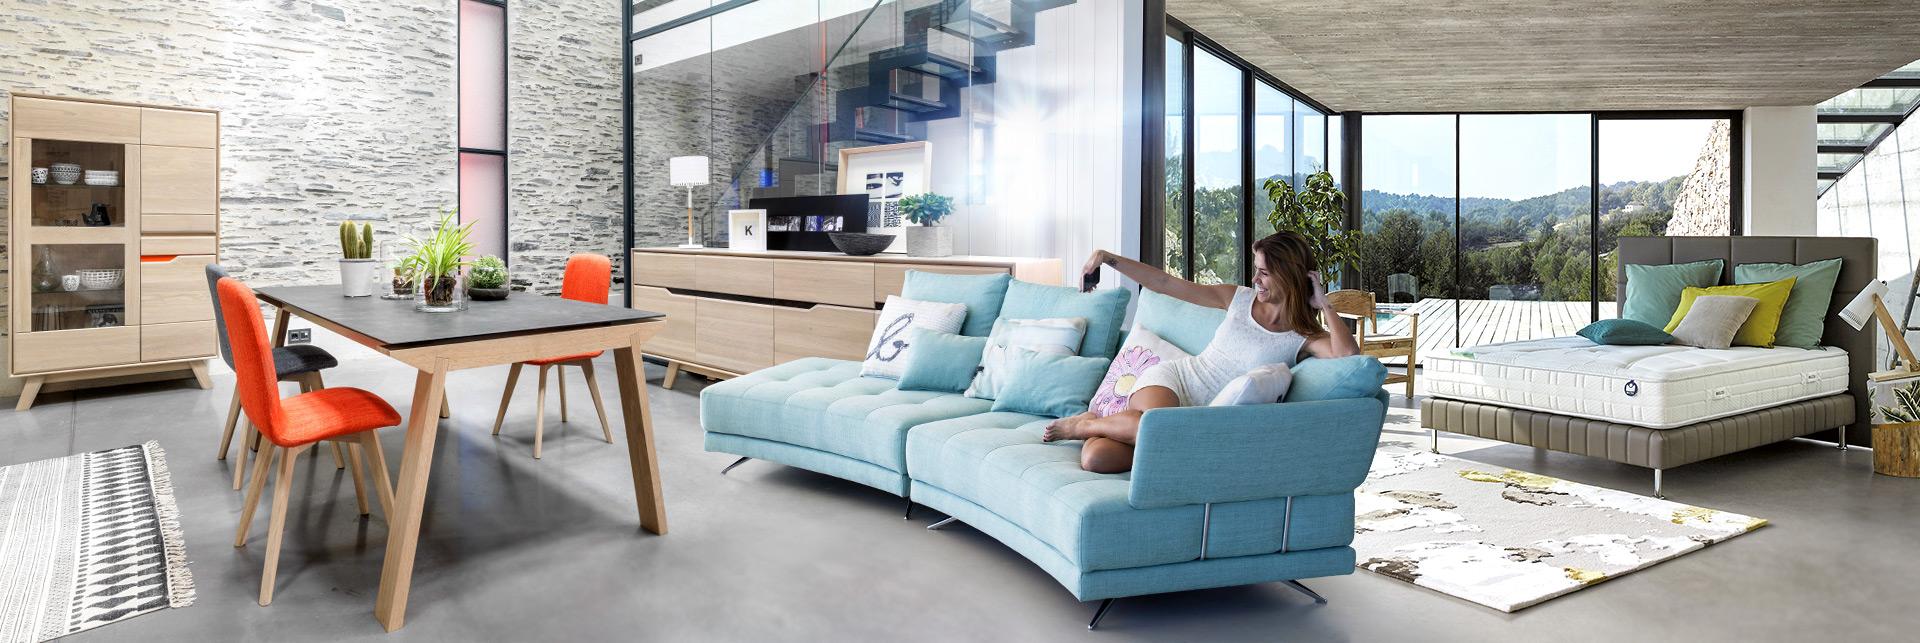 magasin meuble dunkerque excellent meuble d ordinateur en verre lovely source d inspiration. Black Bedroom Furniture Sets. Home Design Ideas